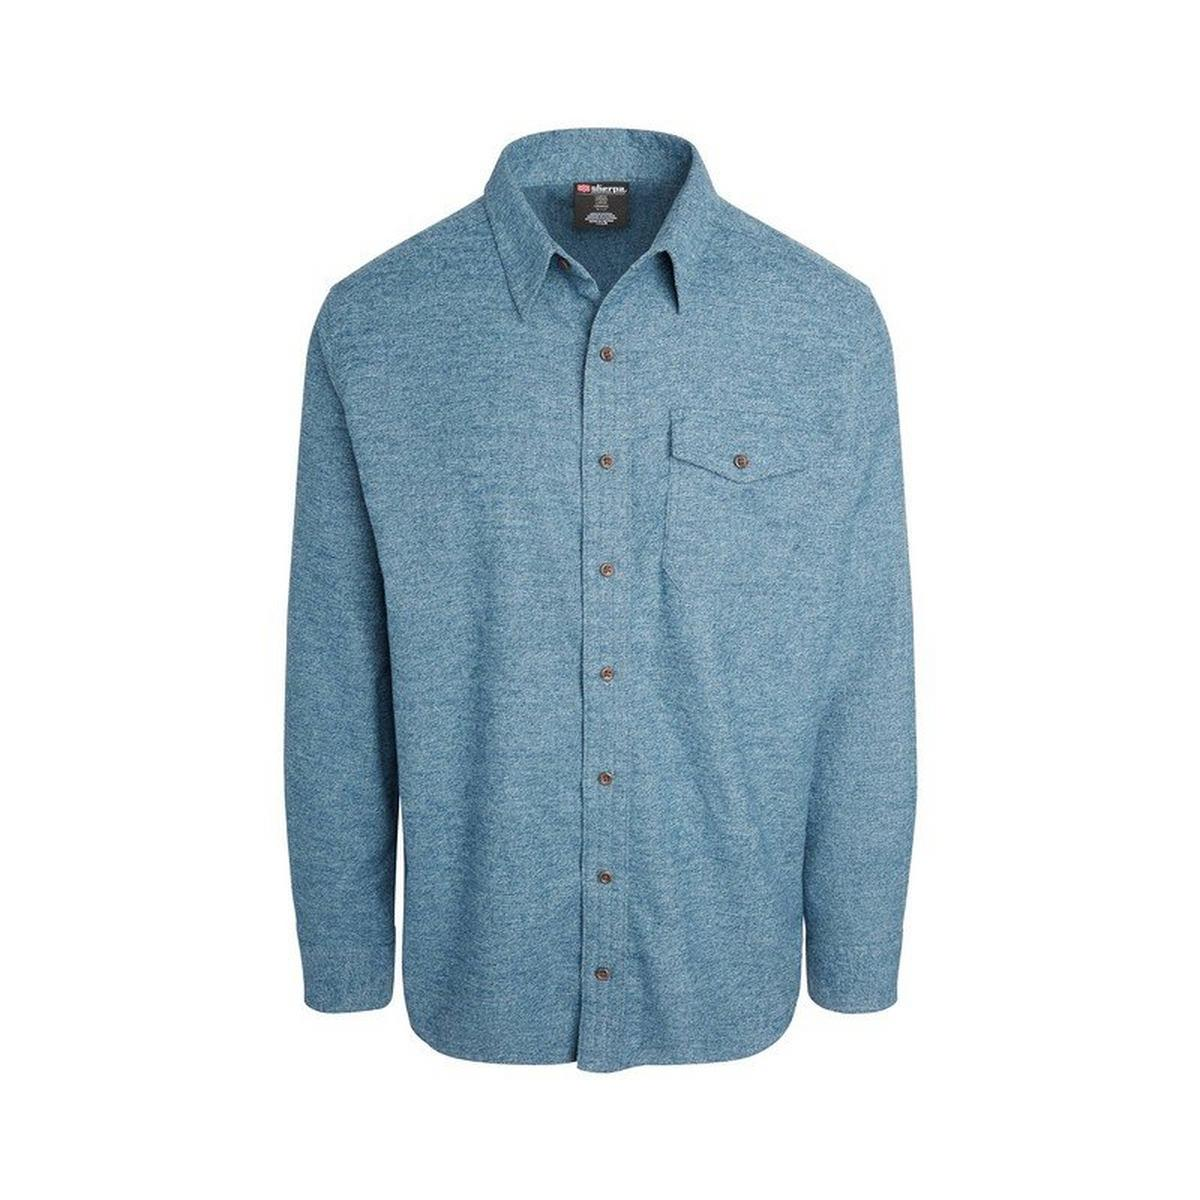 Sherpa Adventure Men's Gelluk Shirt - Rathee Blue